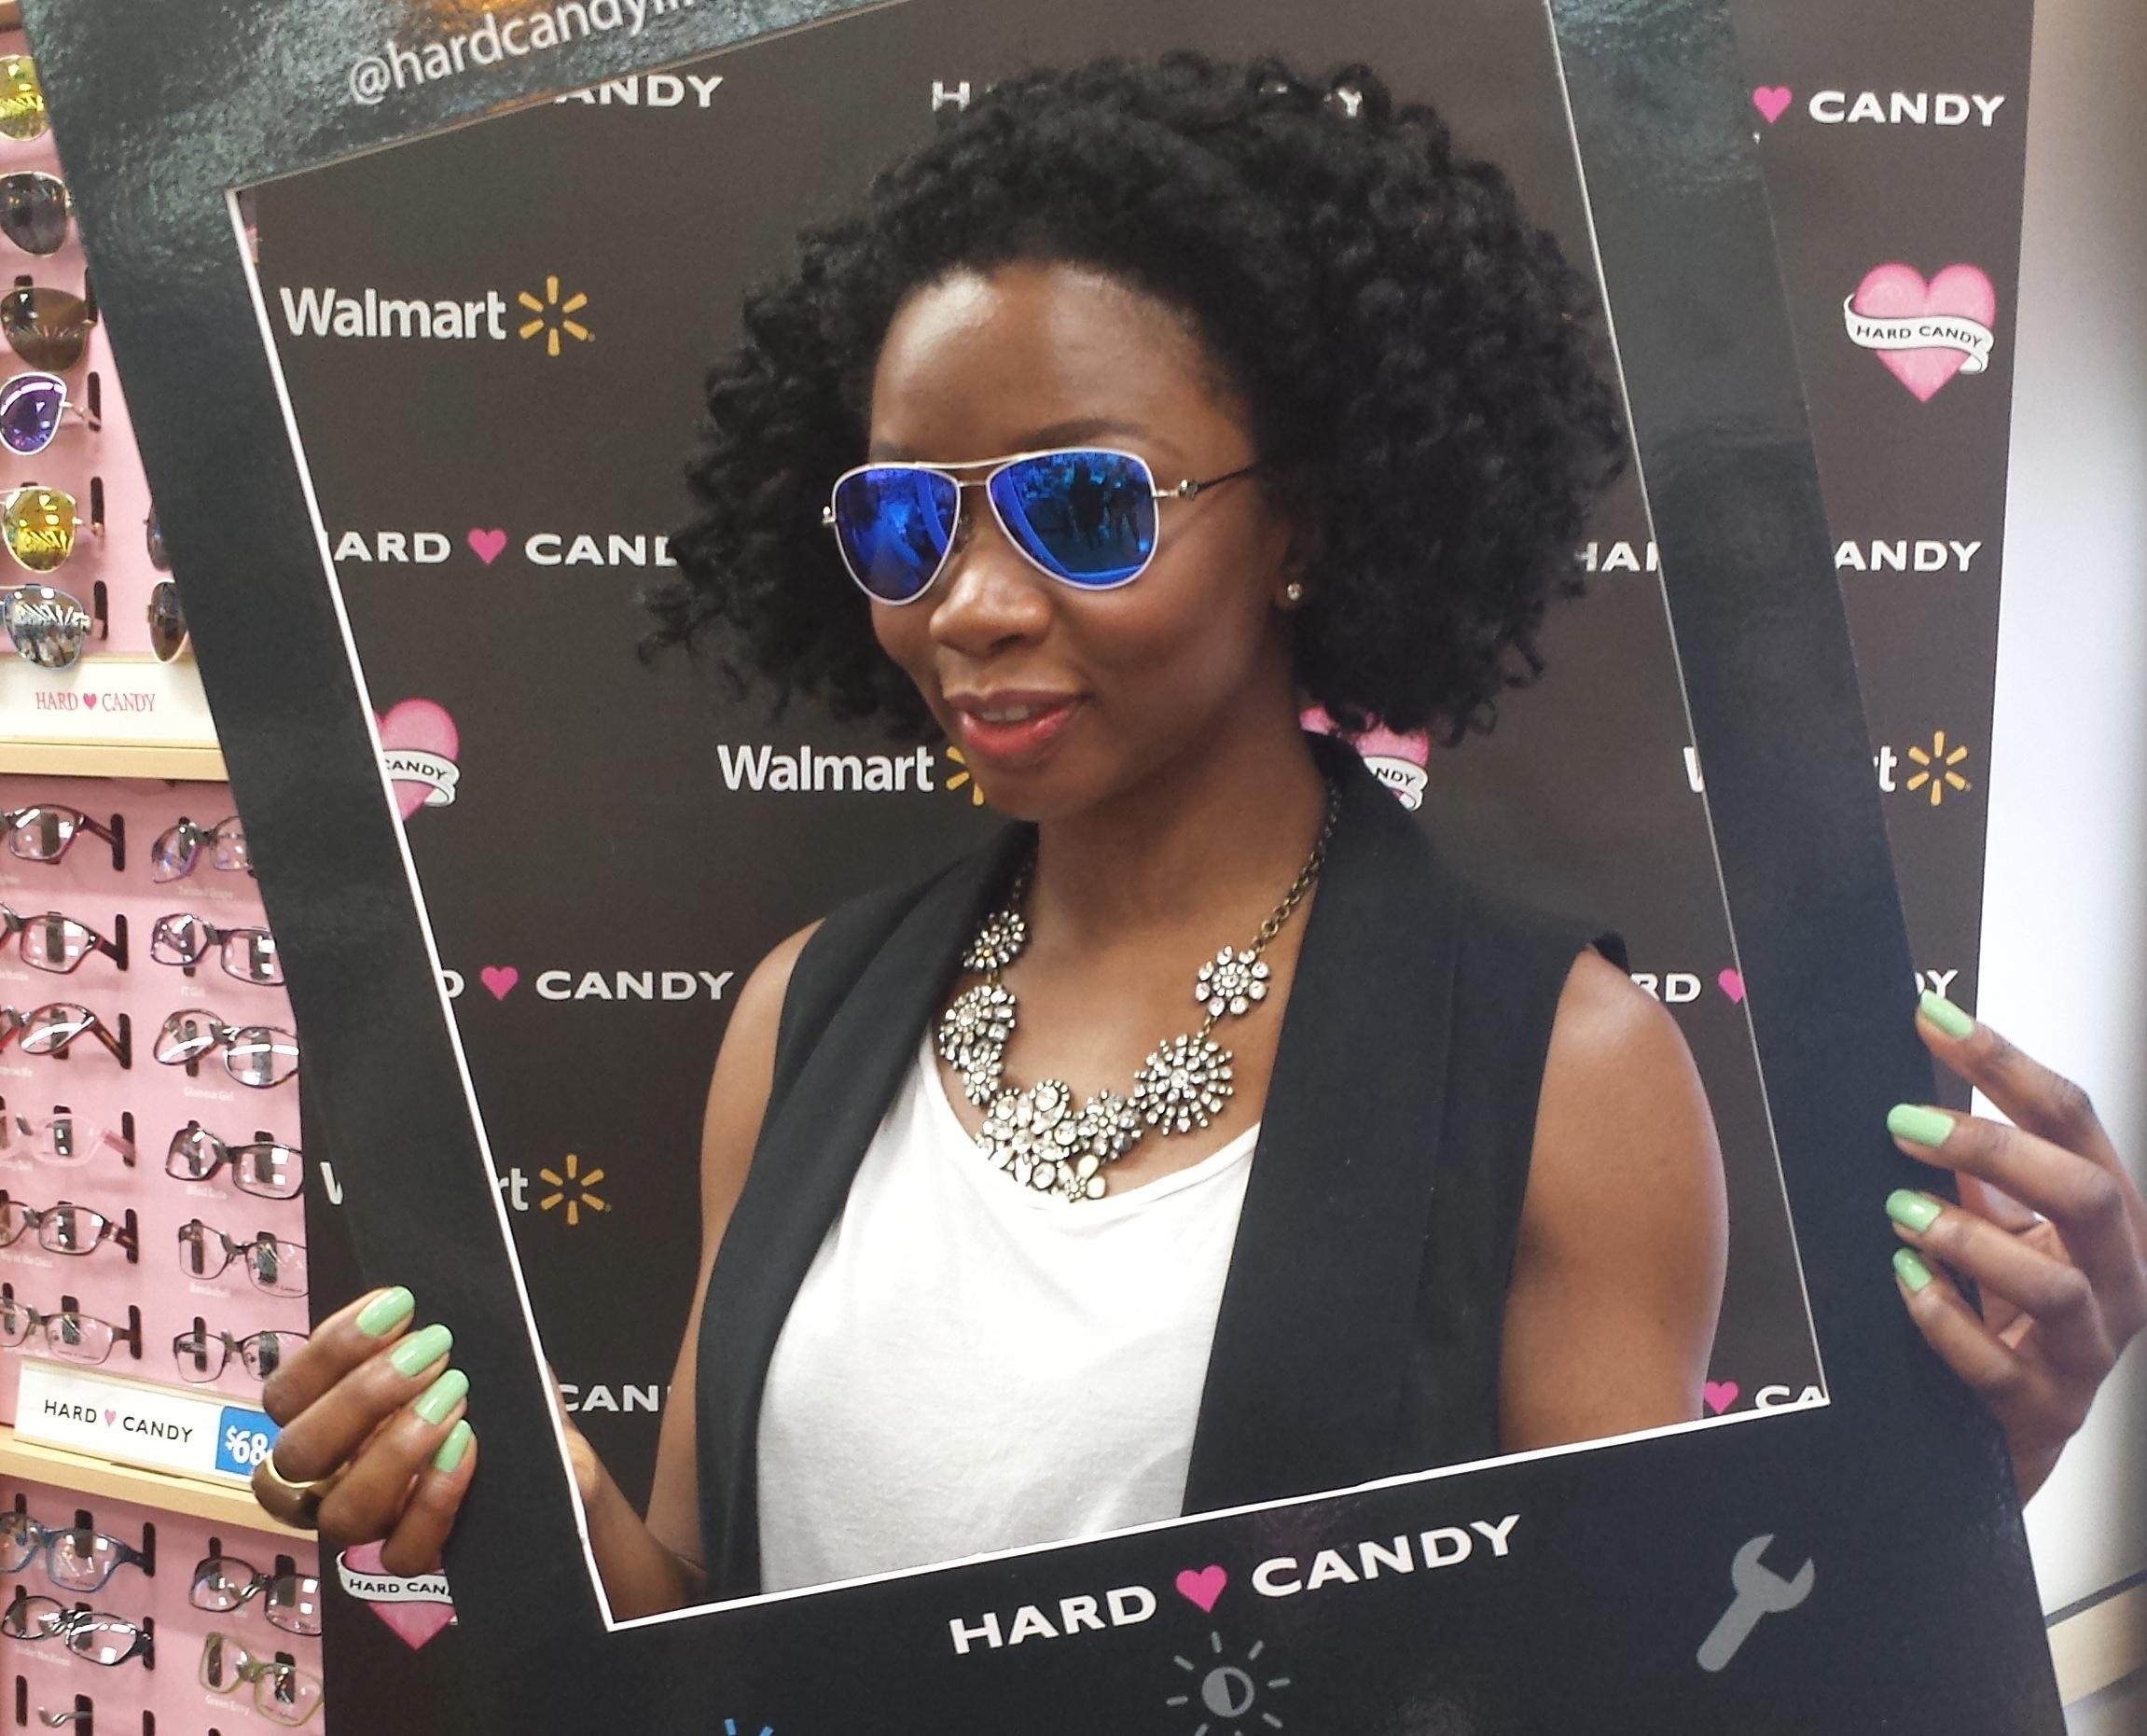 hard candy eye wear collection - Walmart Vision Center Eyeglass Frames